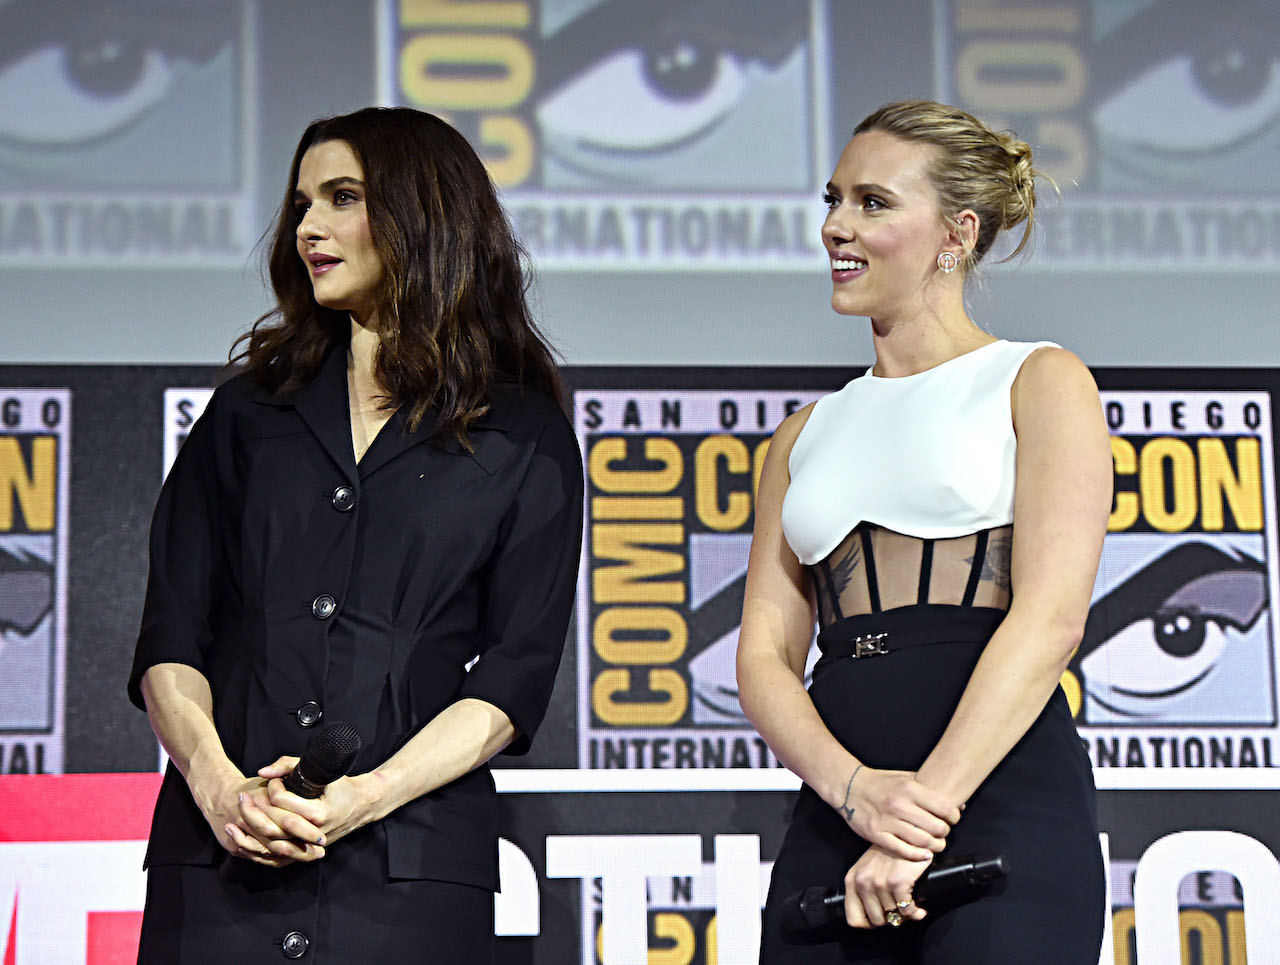 Rachel Weisz and Scarlett Johansson of Marvel Studios' 'Black Widow' at San Diego Comic-Con